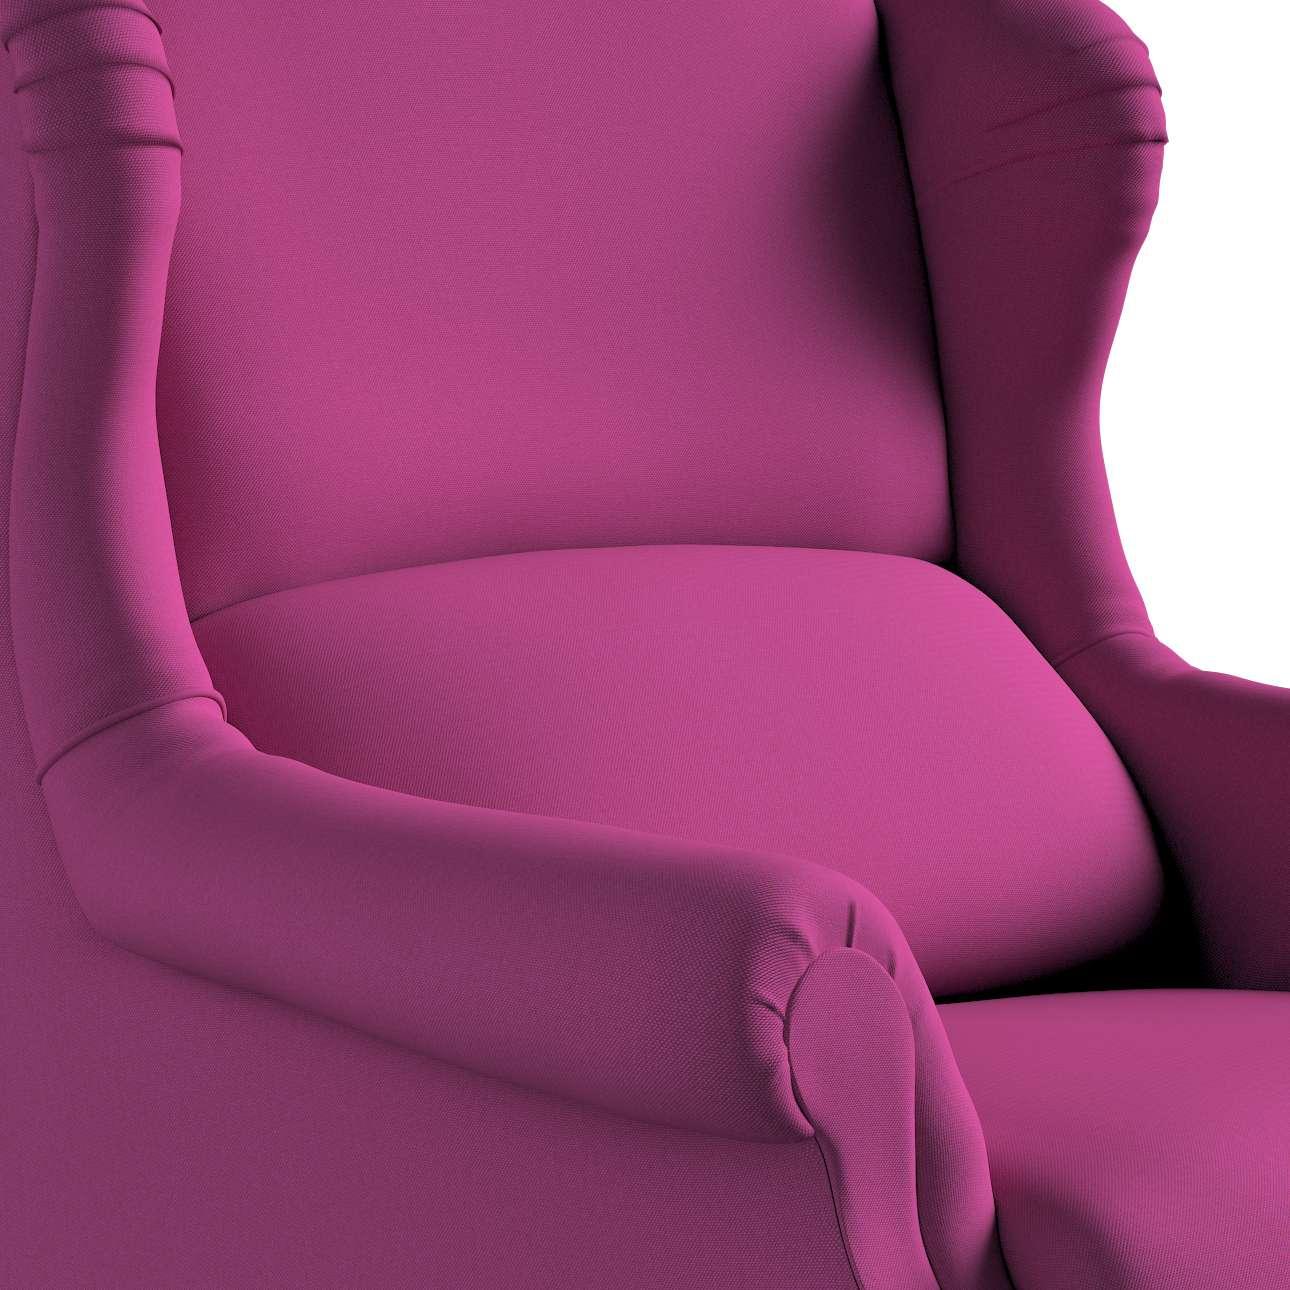 Fotel Unique w kolekcji Etna, tkanina: 705-23